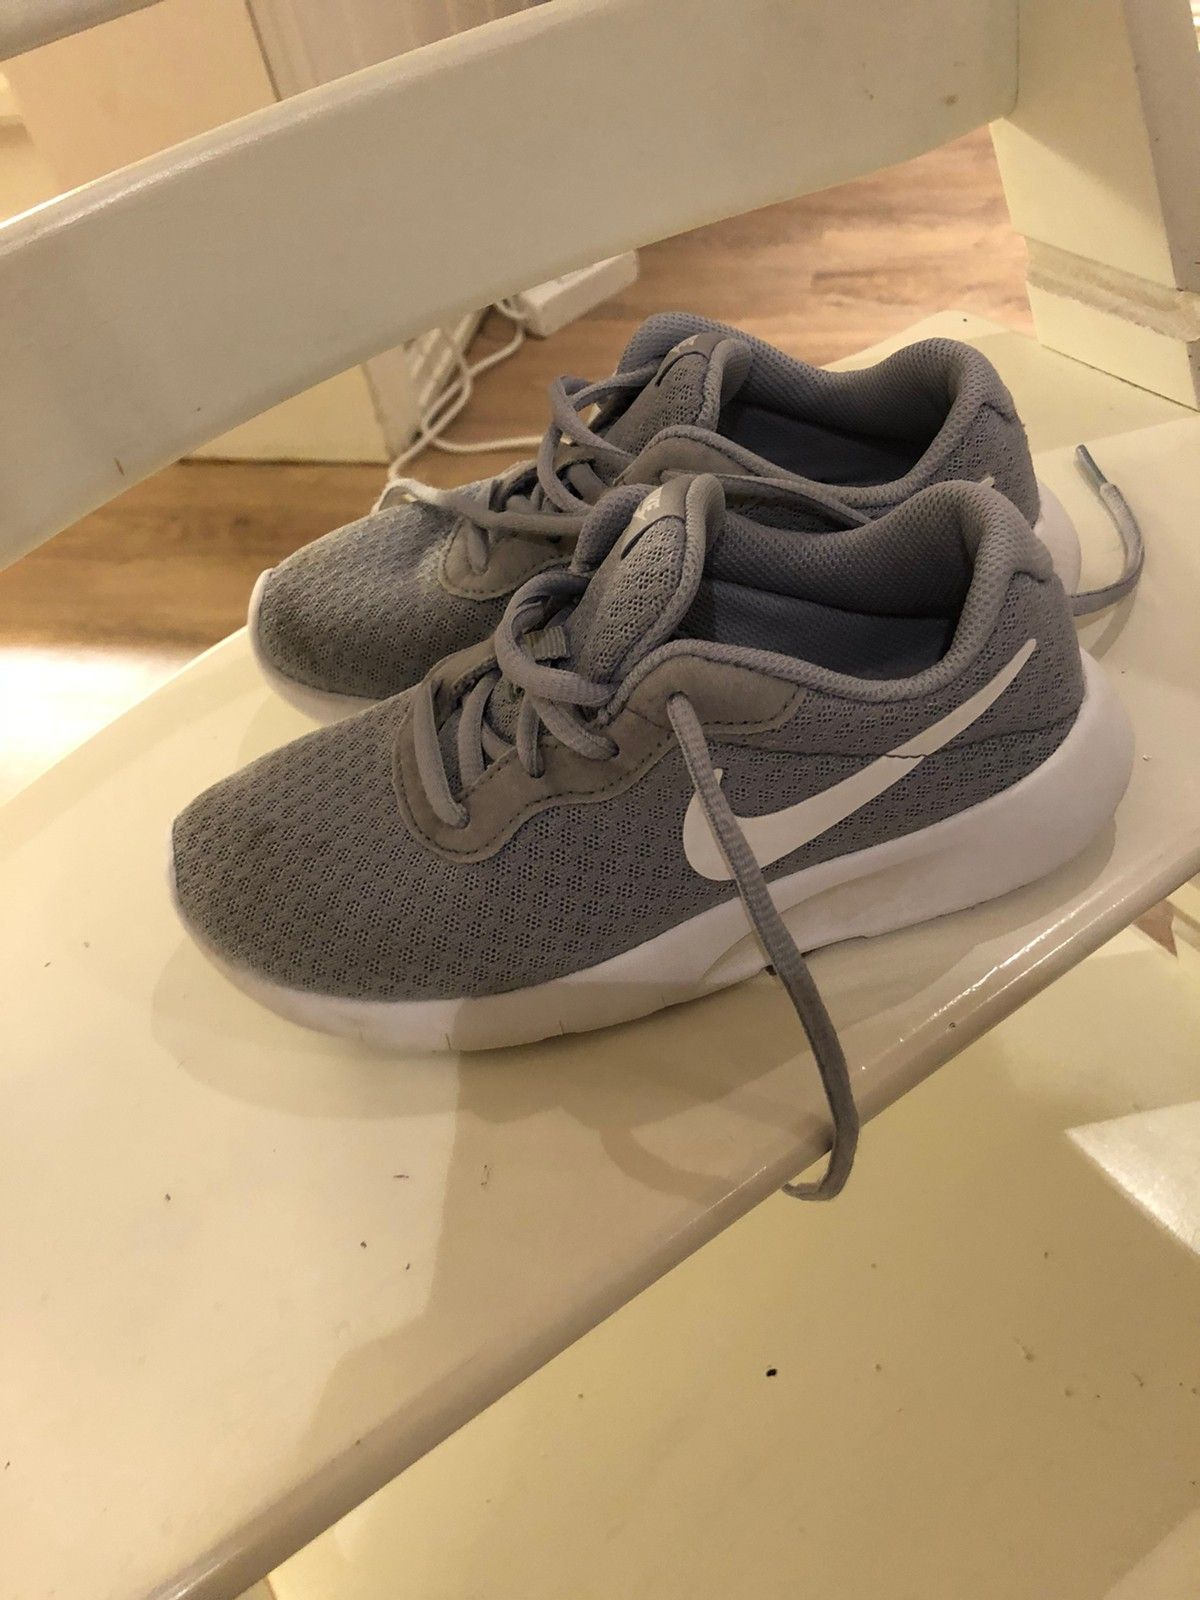 Nike sko str 31 | FINN.no